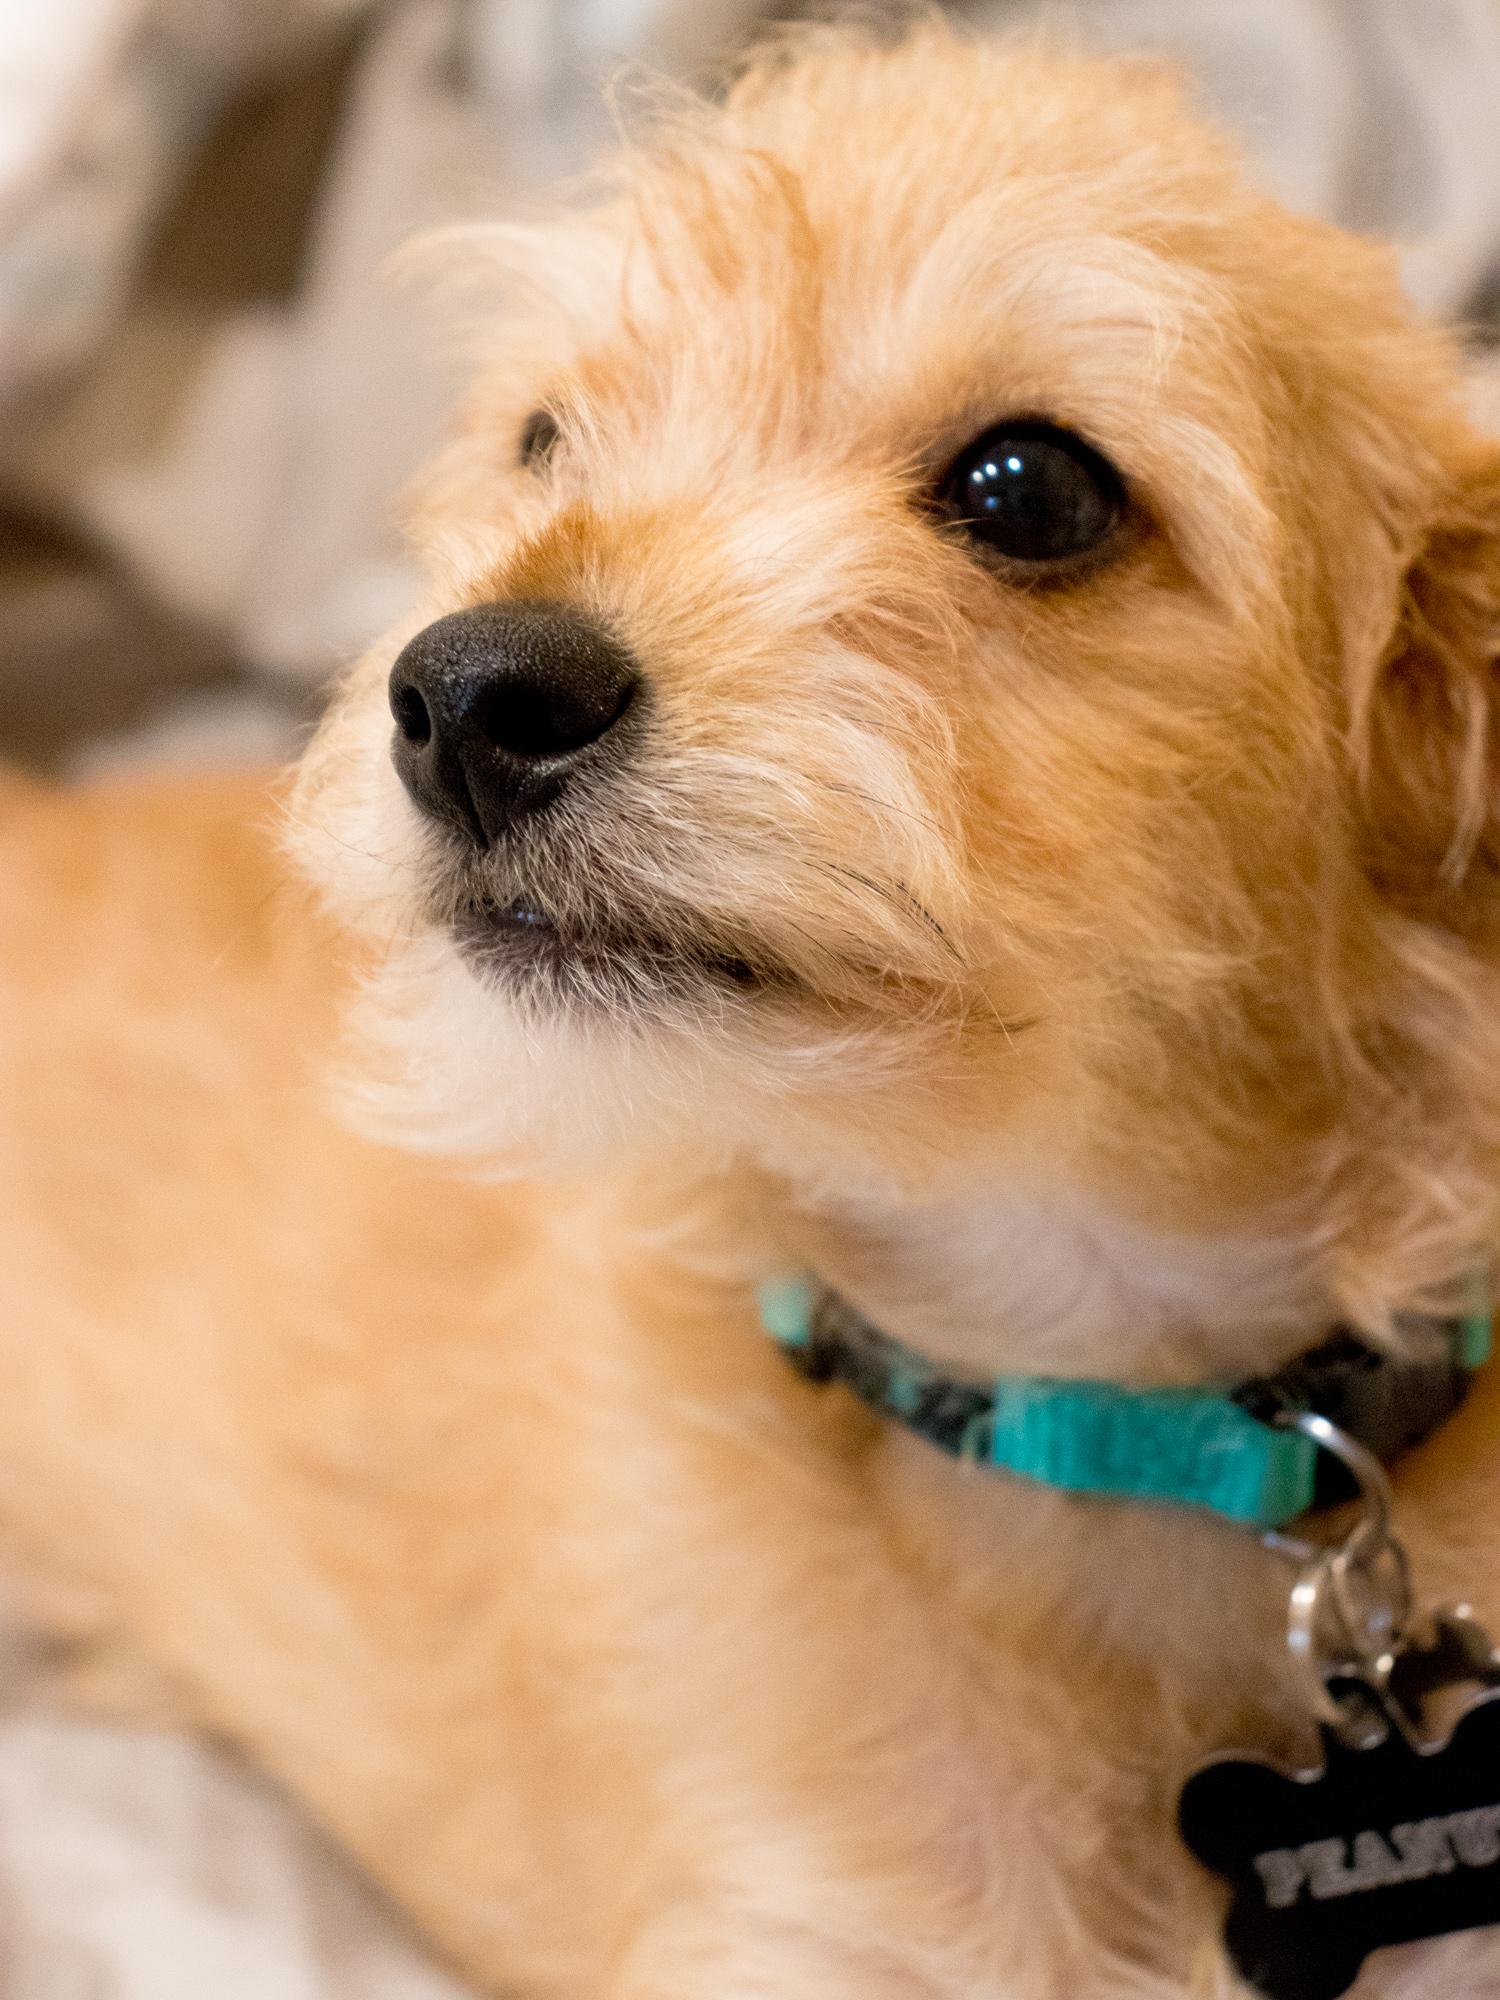 Peanut the Puppy